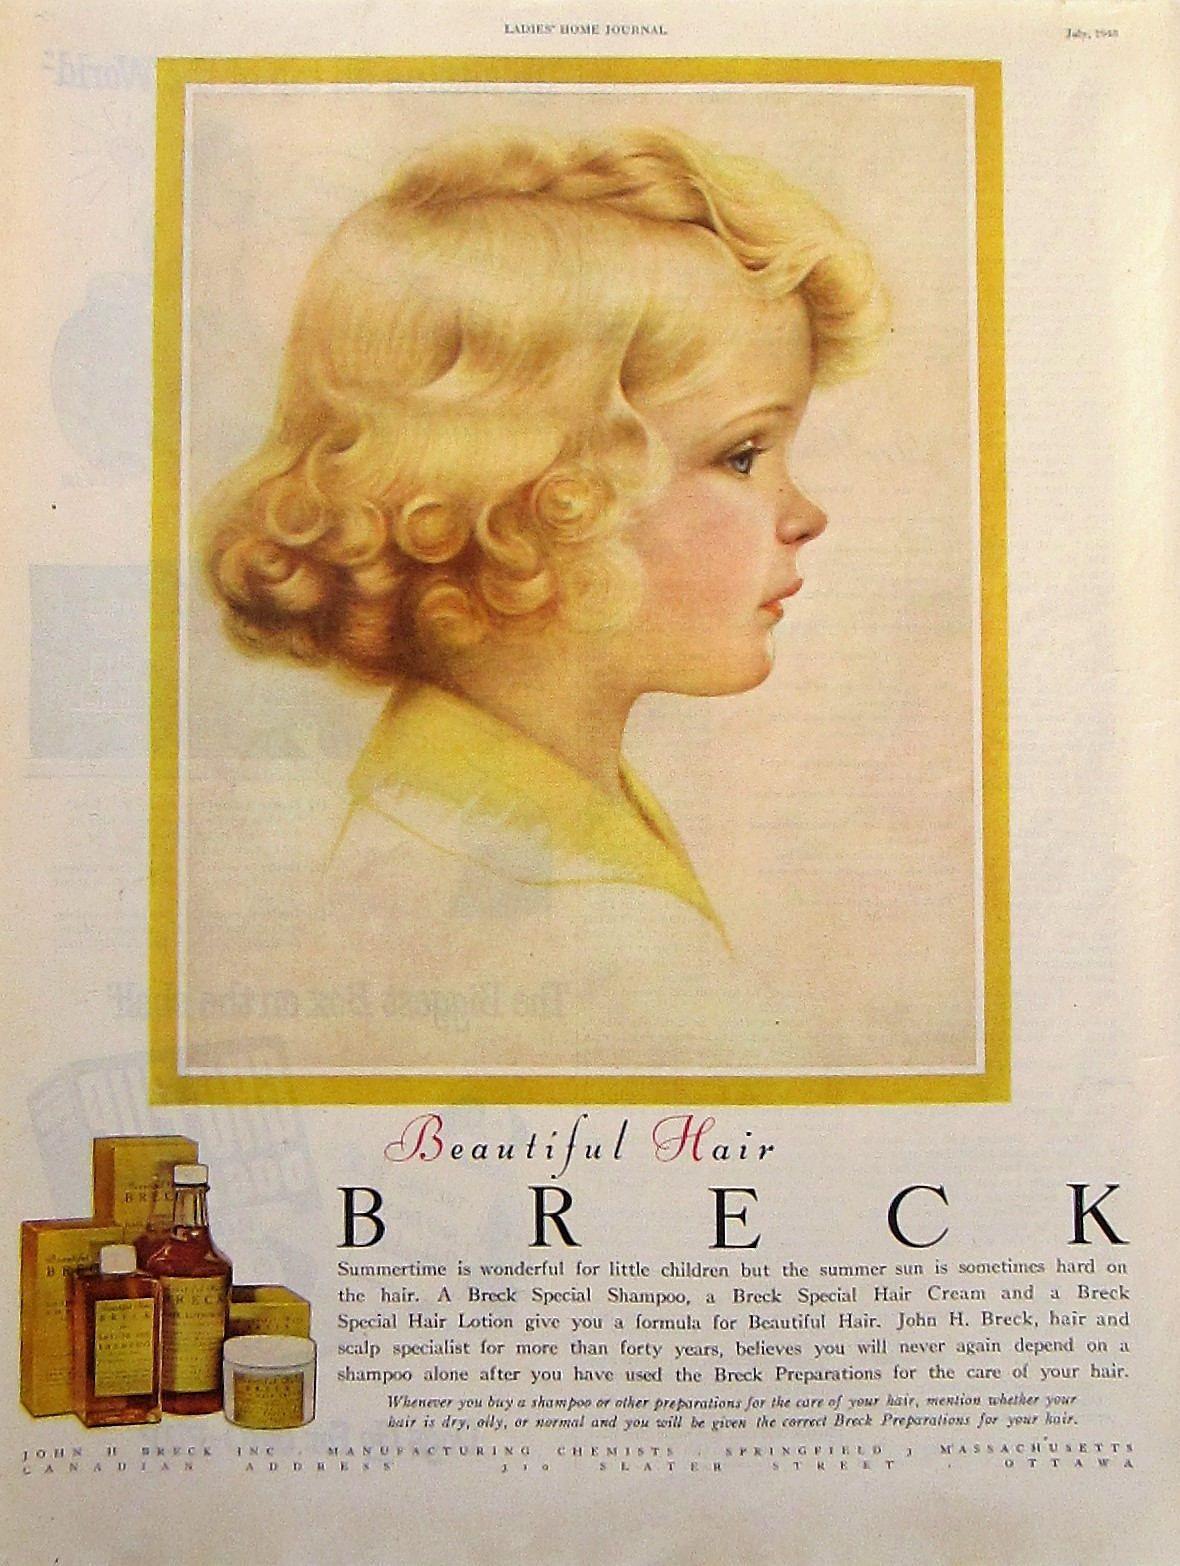 breck shampoo vintage advertisement bathroom wall art girls